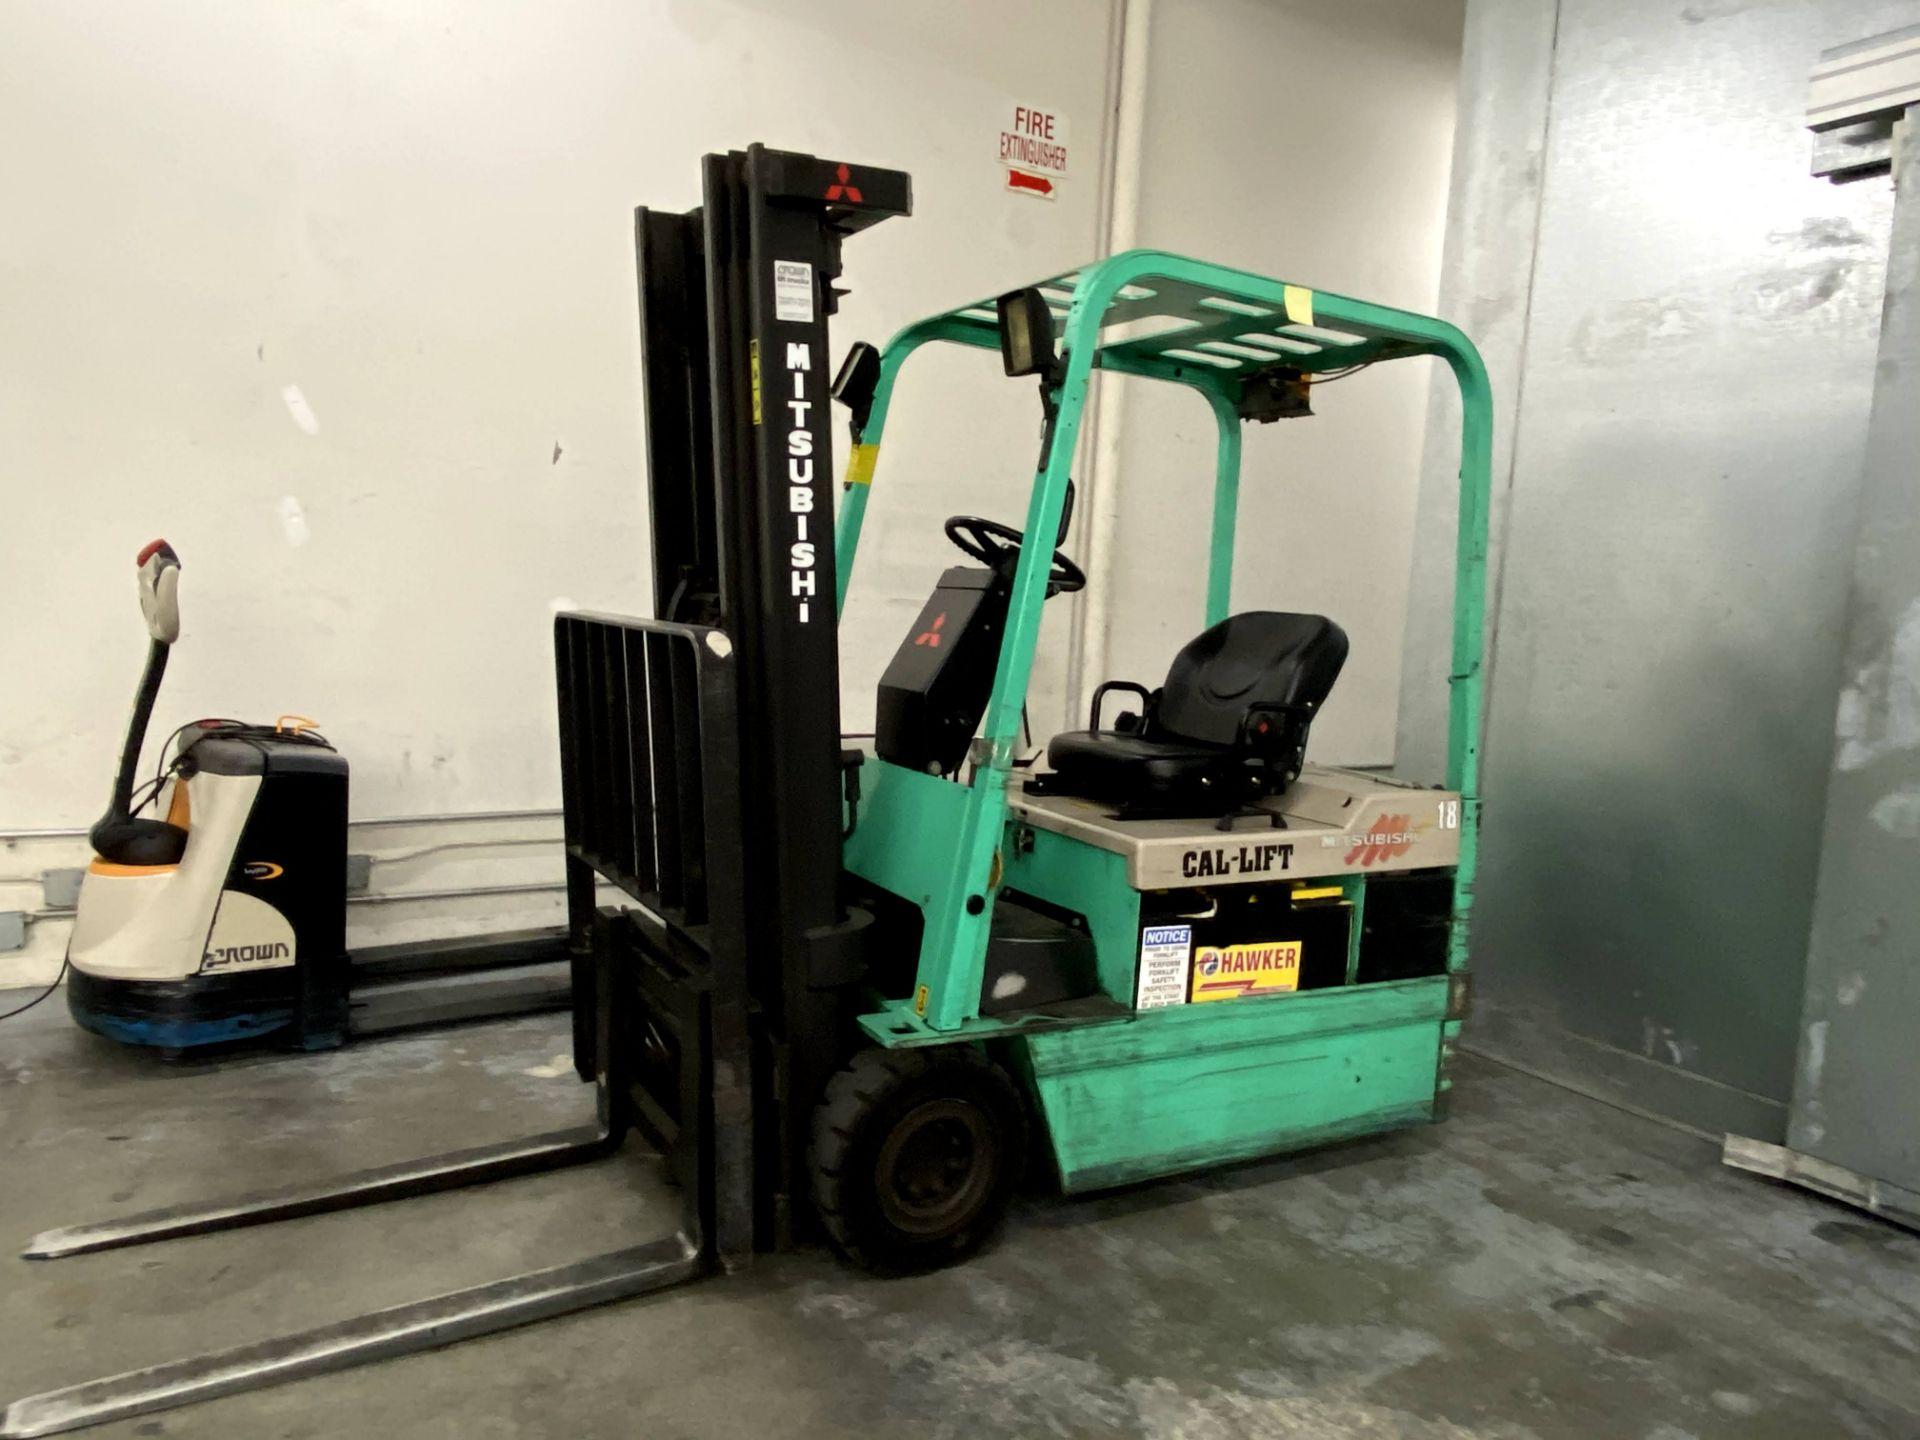 Mitsubishi Electric Forklift - Image 2 of 10